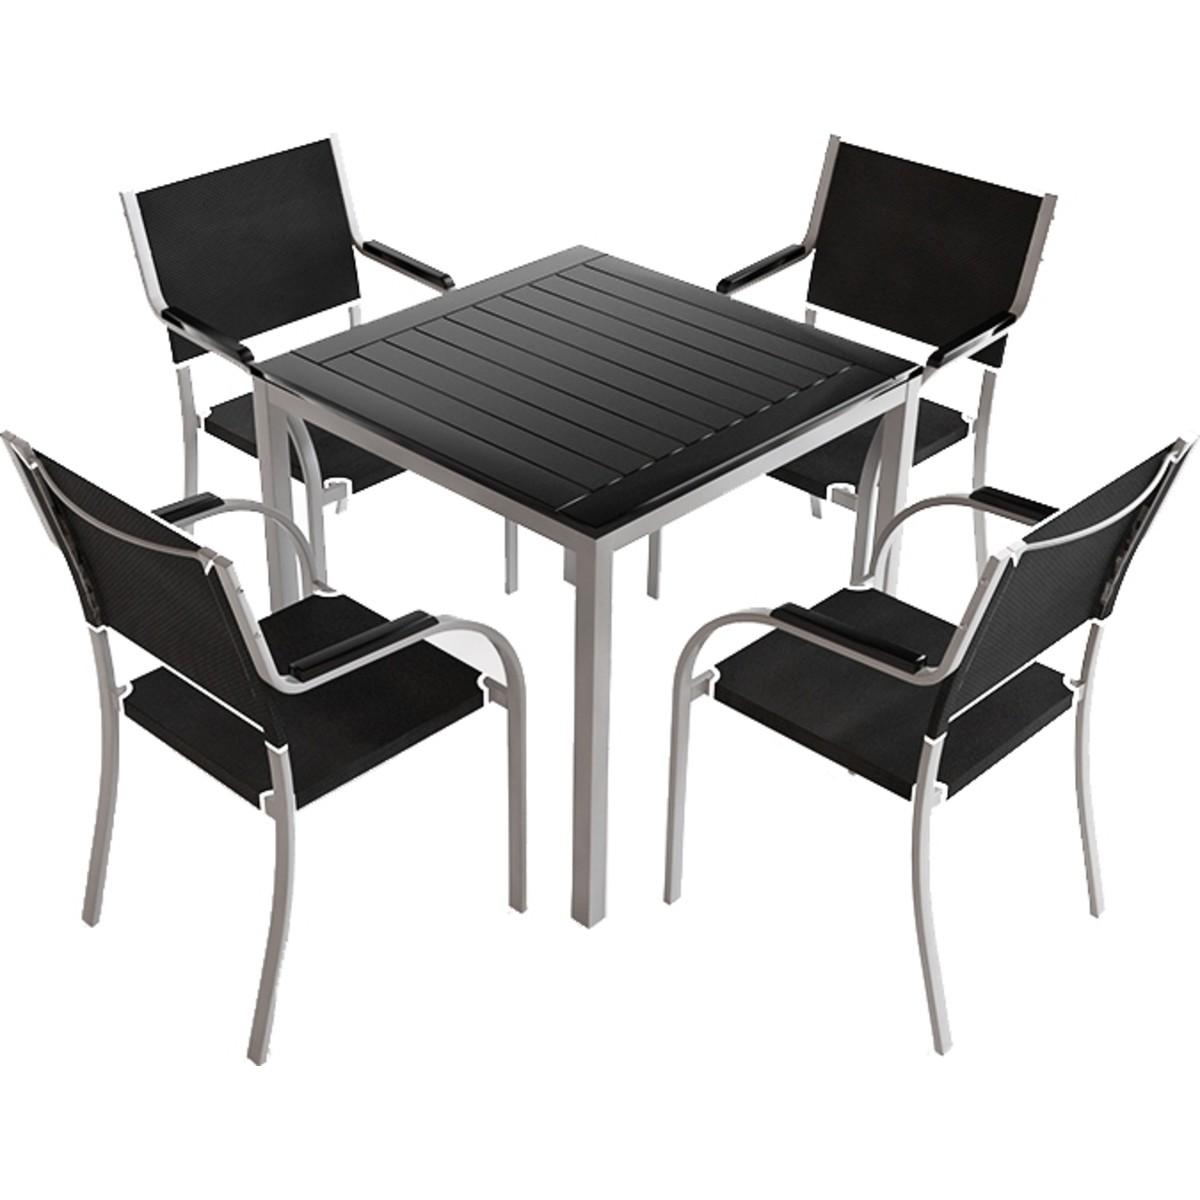 Комплект садовой мебели Самара 1 стол и 4 стула